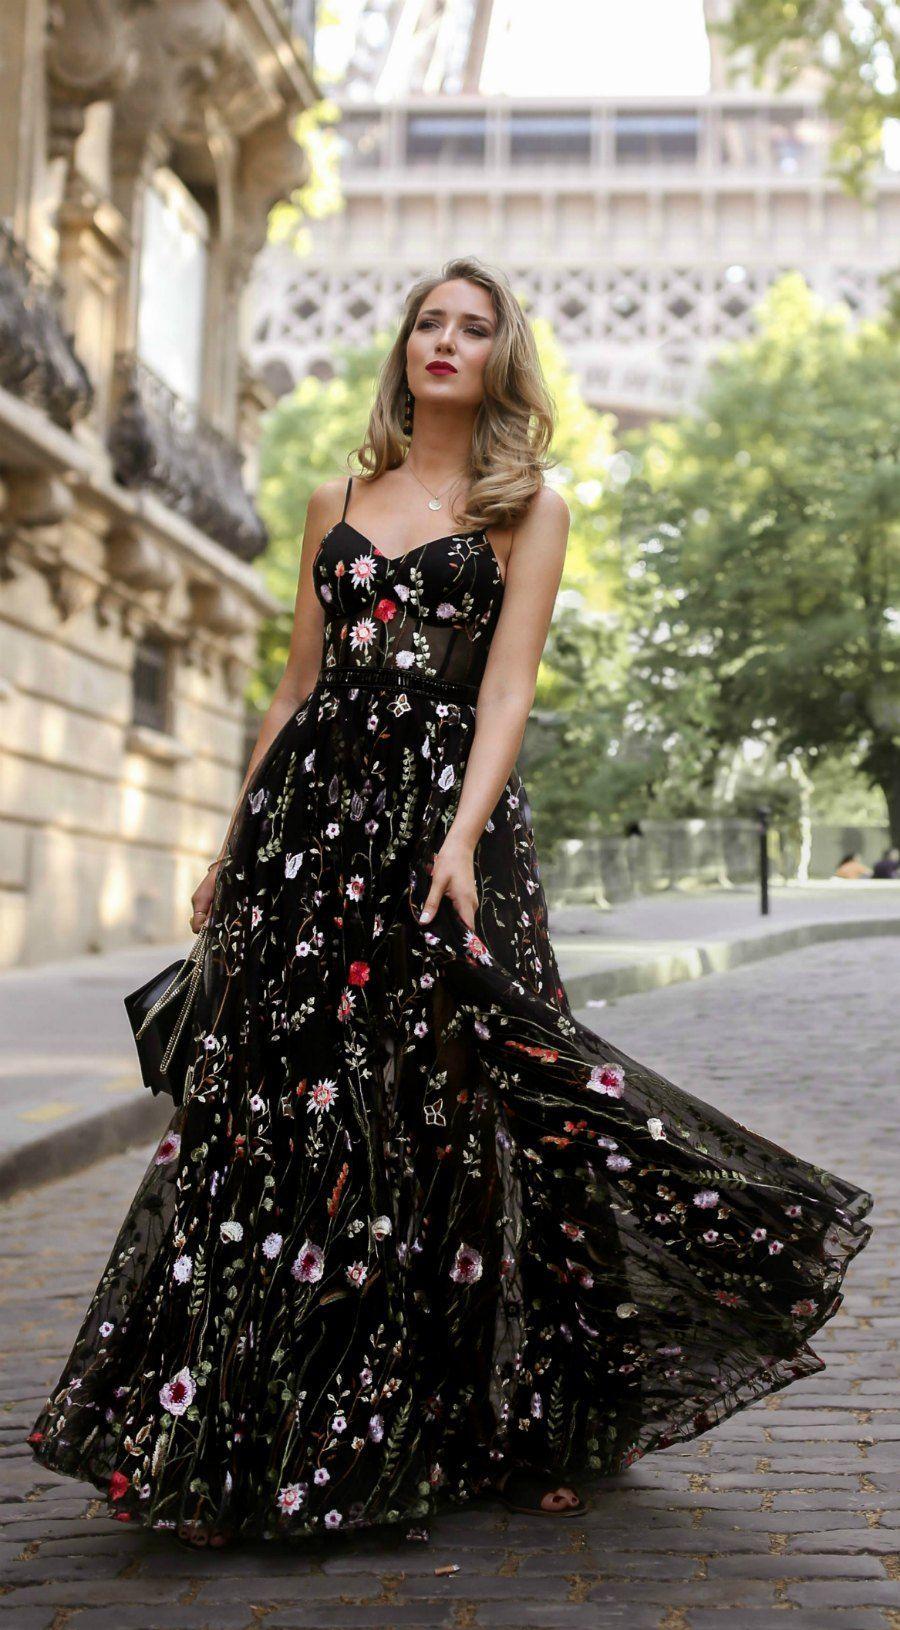 8169661b2cd 30 Dresses in 30 Days